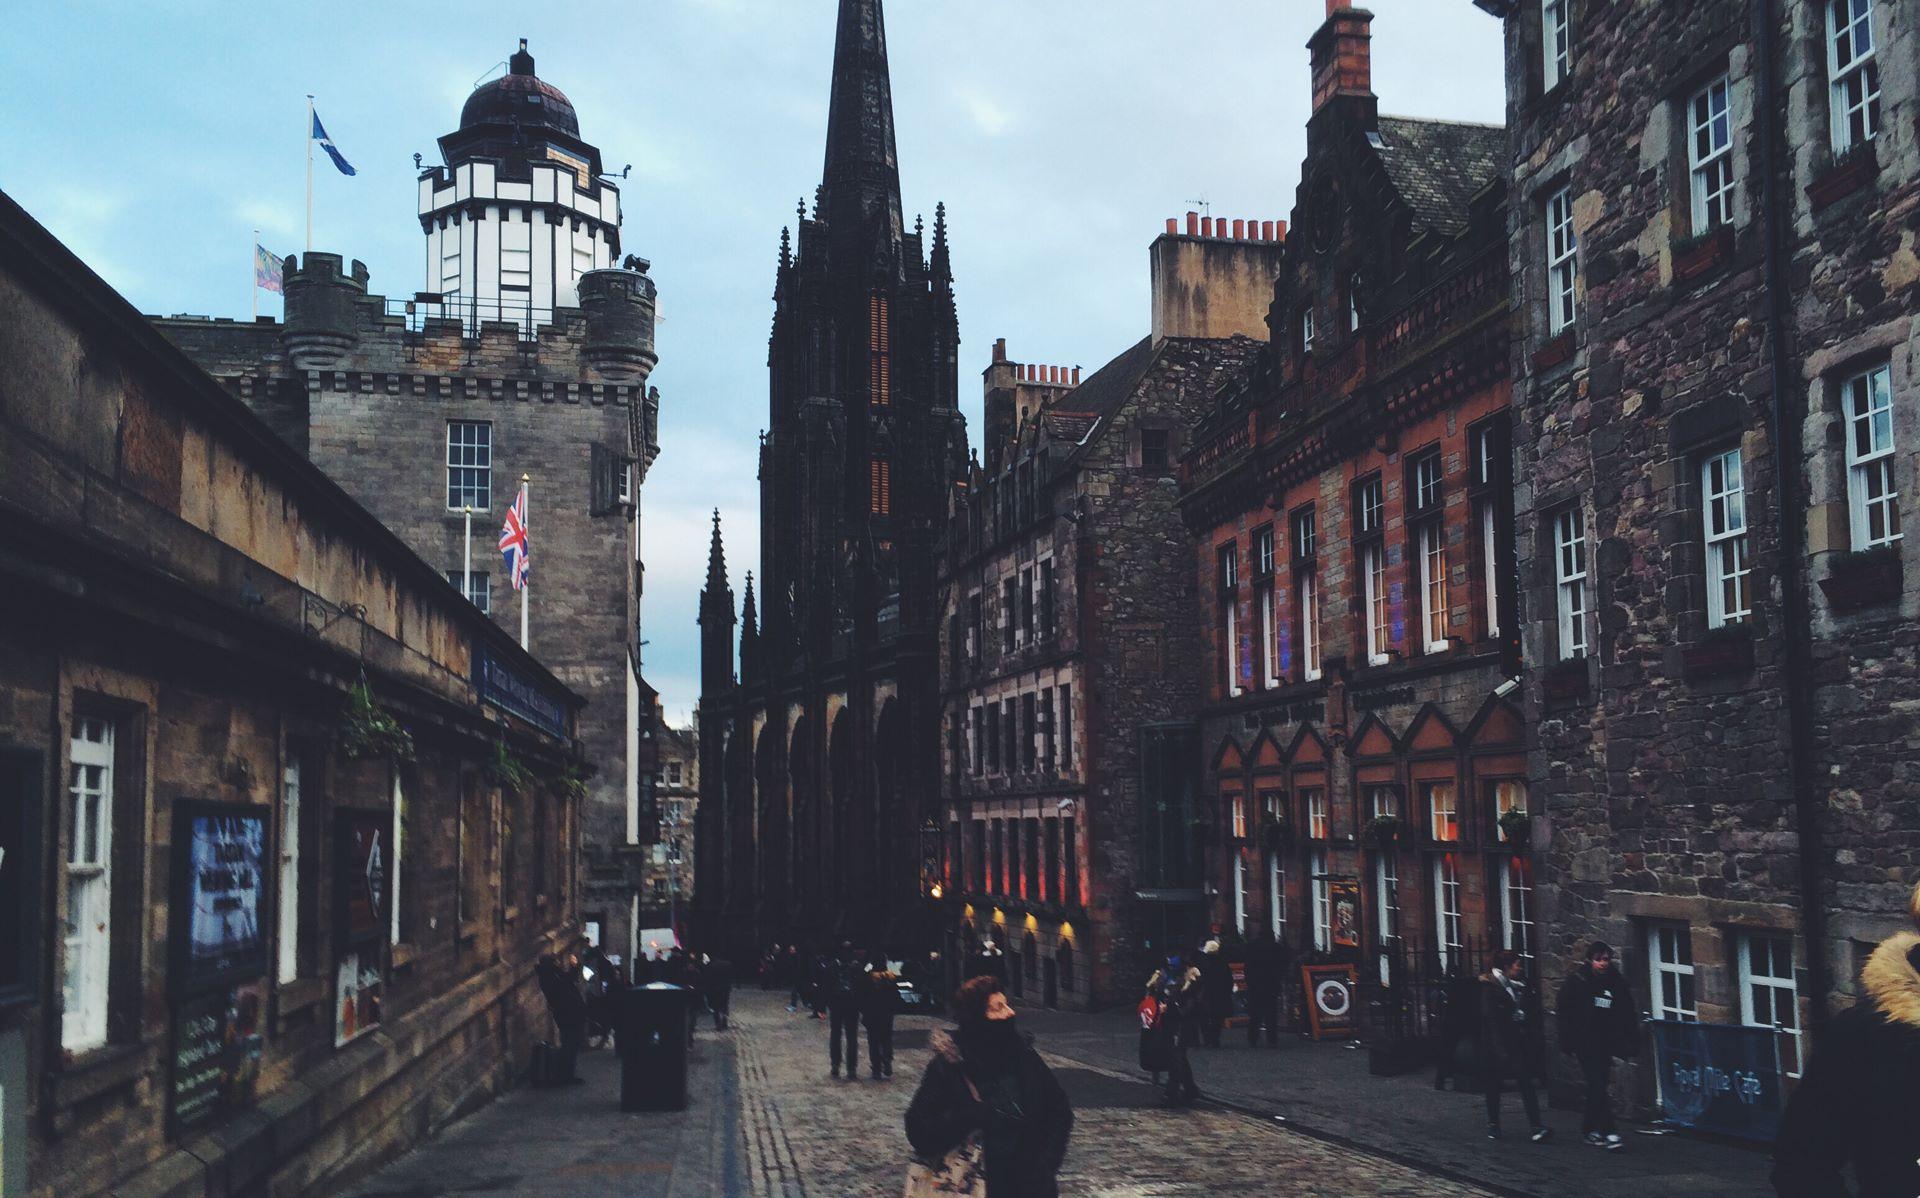 View of the Outlook Tower down Castlehill, Edinburgh